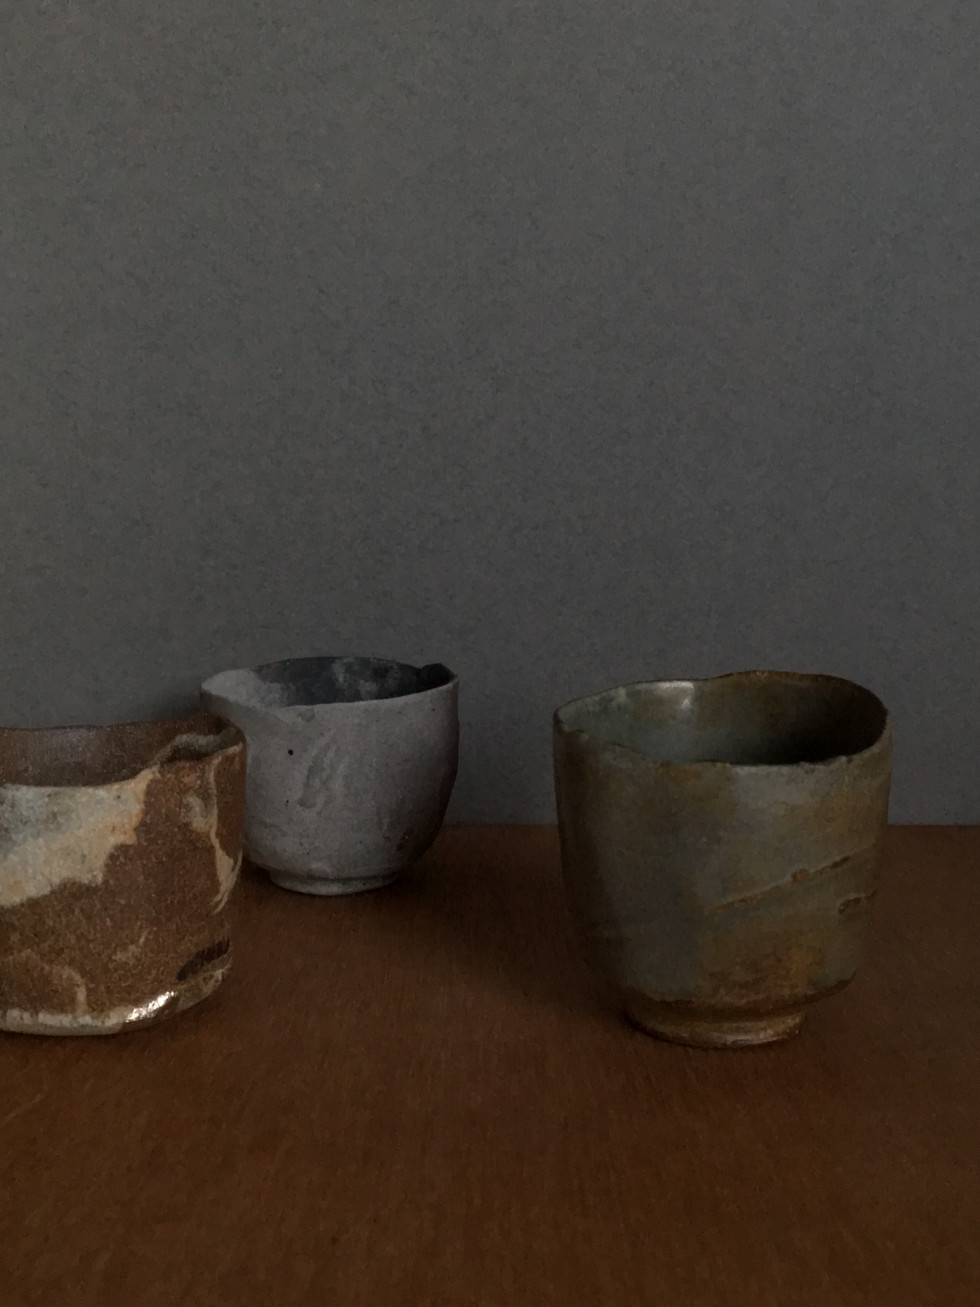 tania rollond_1195 cups_2019.jpg